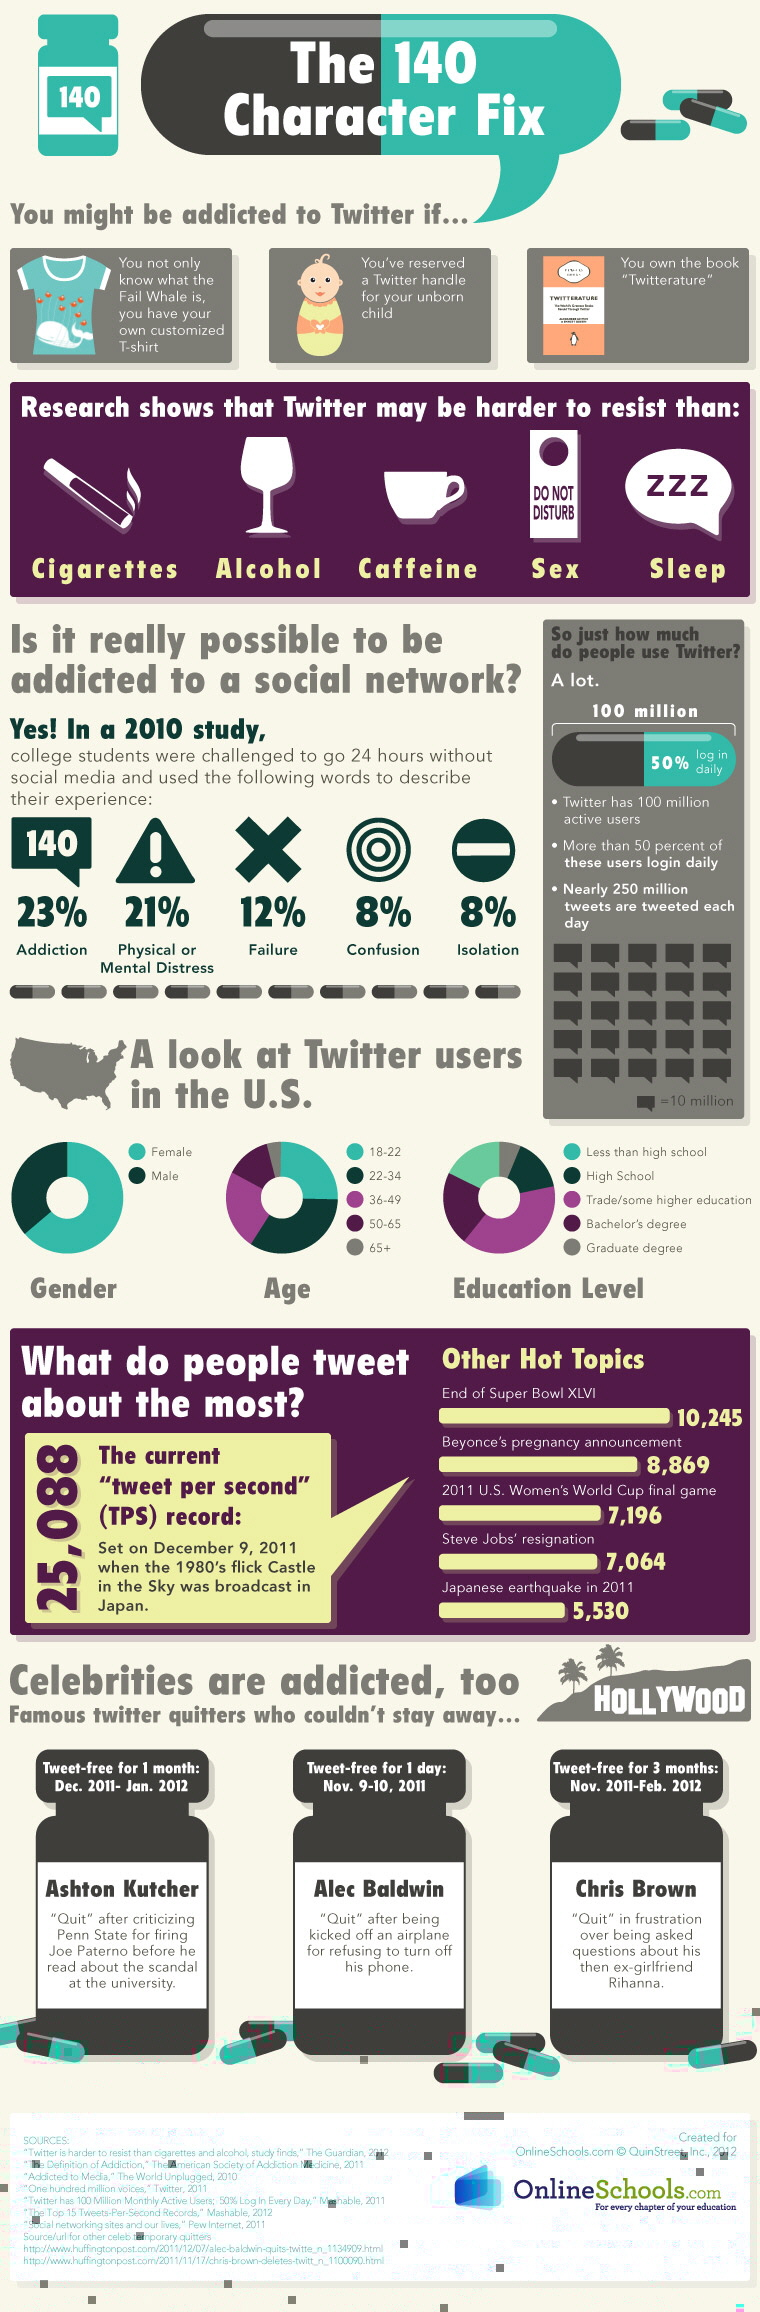 Twitter Bağımlısı mısınız?